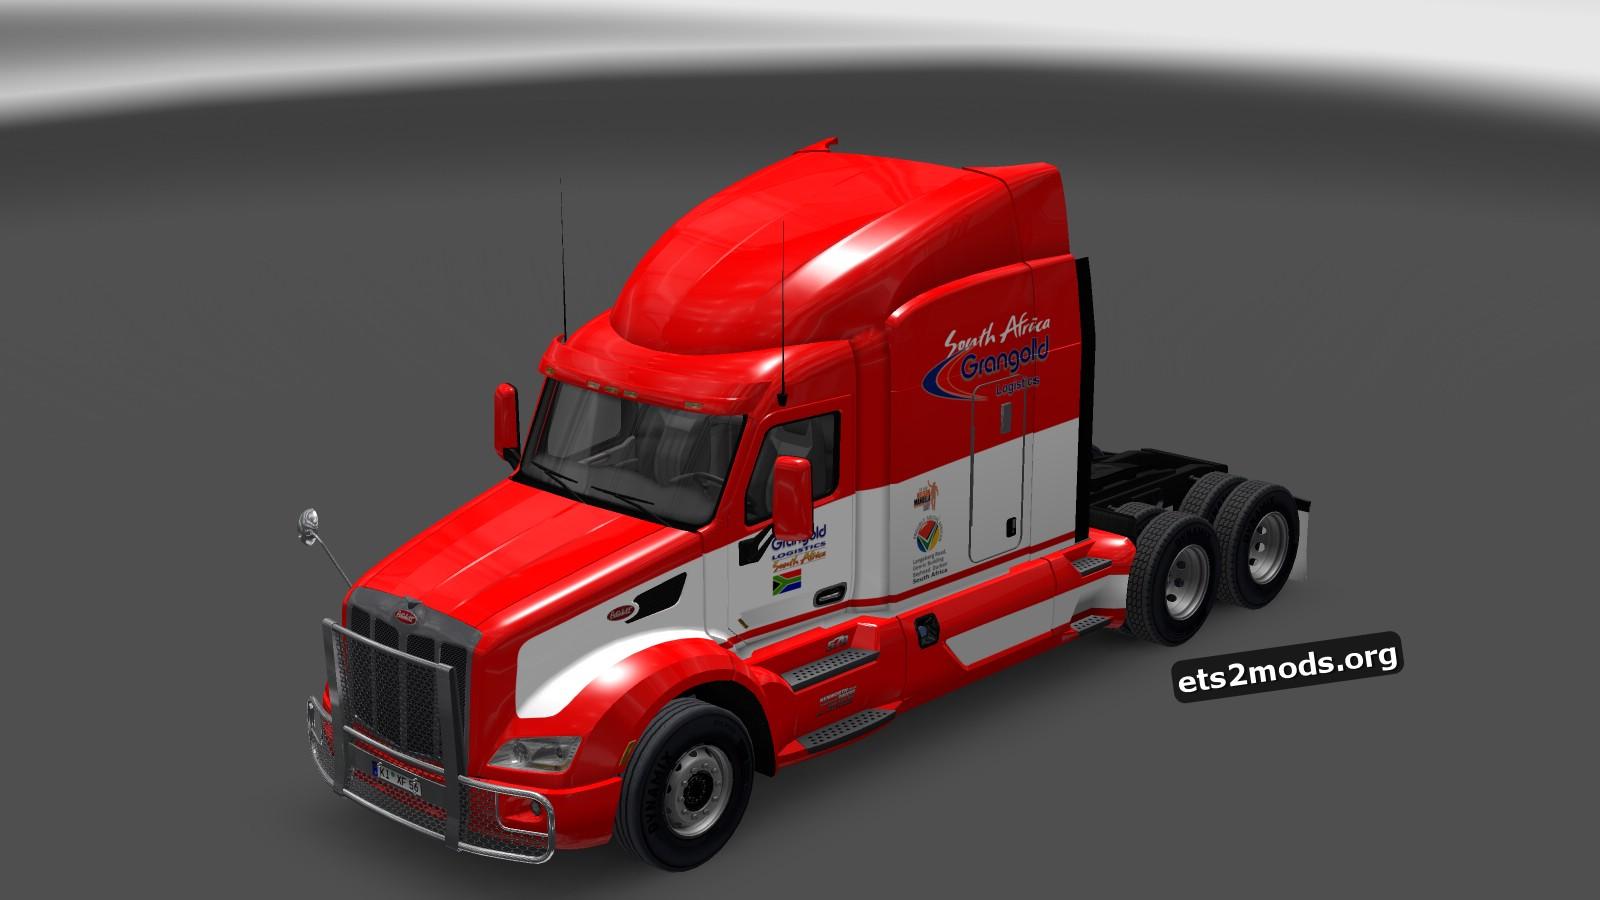 Grangold Logistics Skin for Peterbilt 579